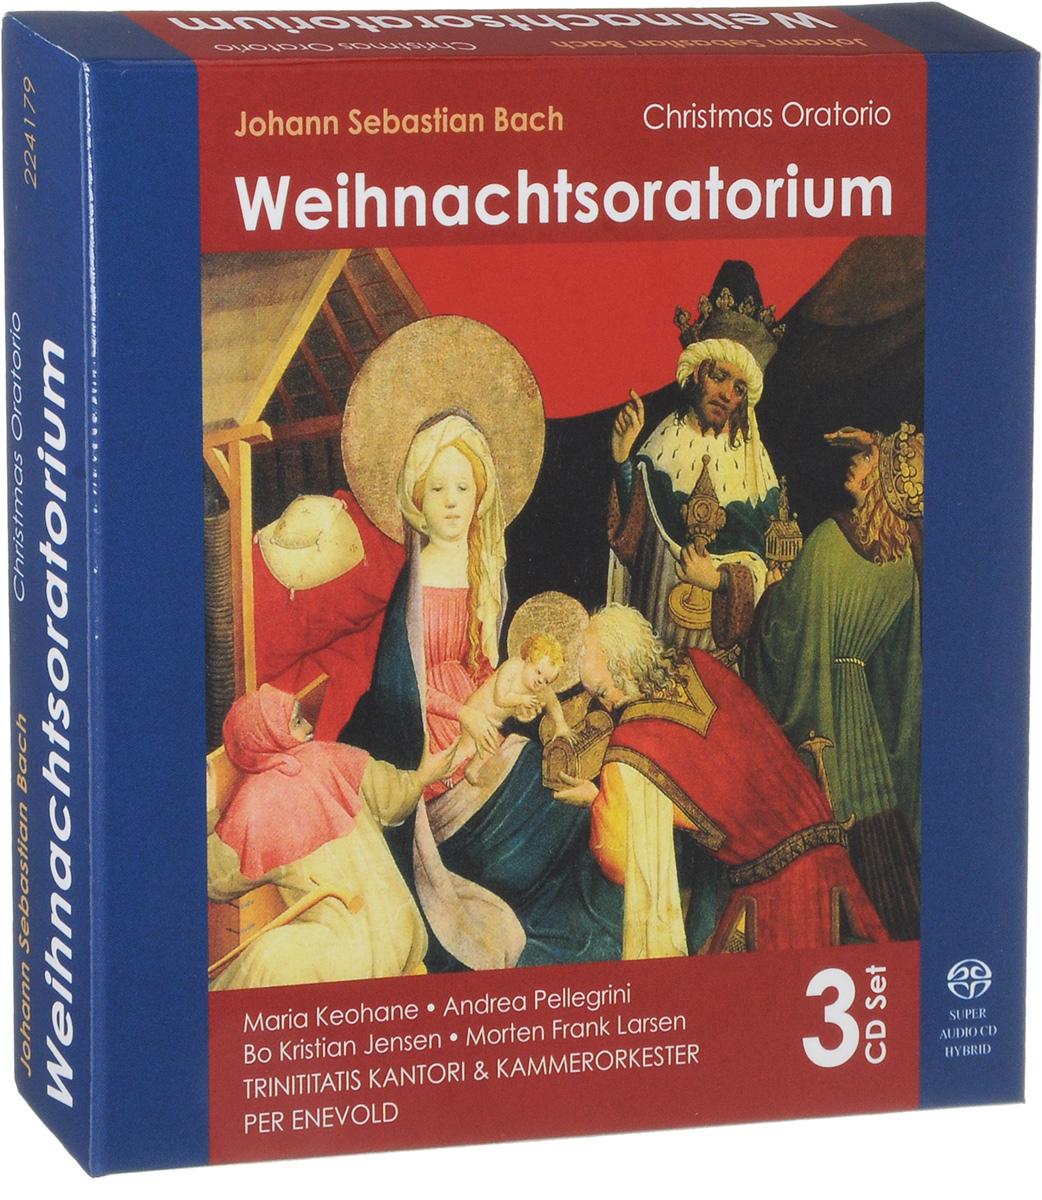 Per Enevold,Trinitatis Kantori & Kammerorkester Per Enevold. Johann Sebastian Bach. Weihnachtsoratorium (3 SACD) johann georg albrechtsberger albrechtsberger concerto per trombone alto ed archi